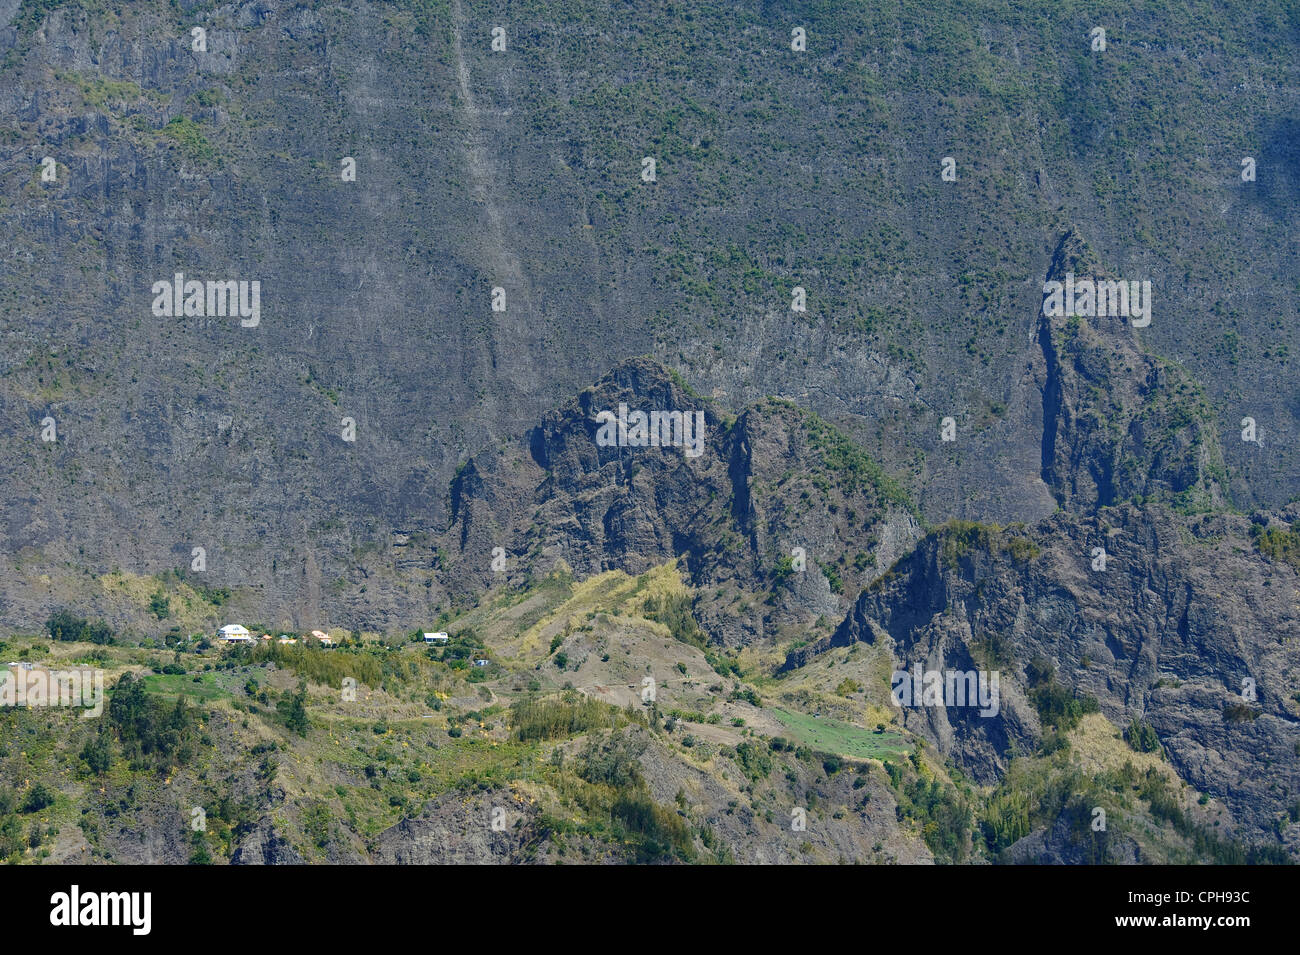 hollow, Cilaos, Africa, Indian ocean, La Reunion, scenery, volcanically - Stock Image